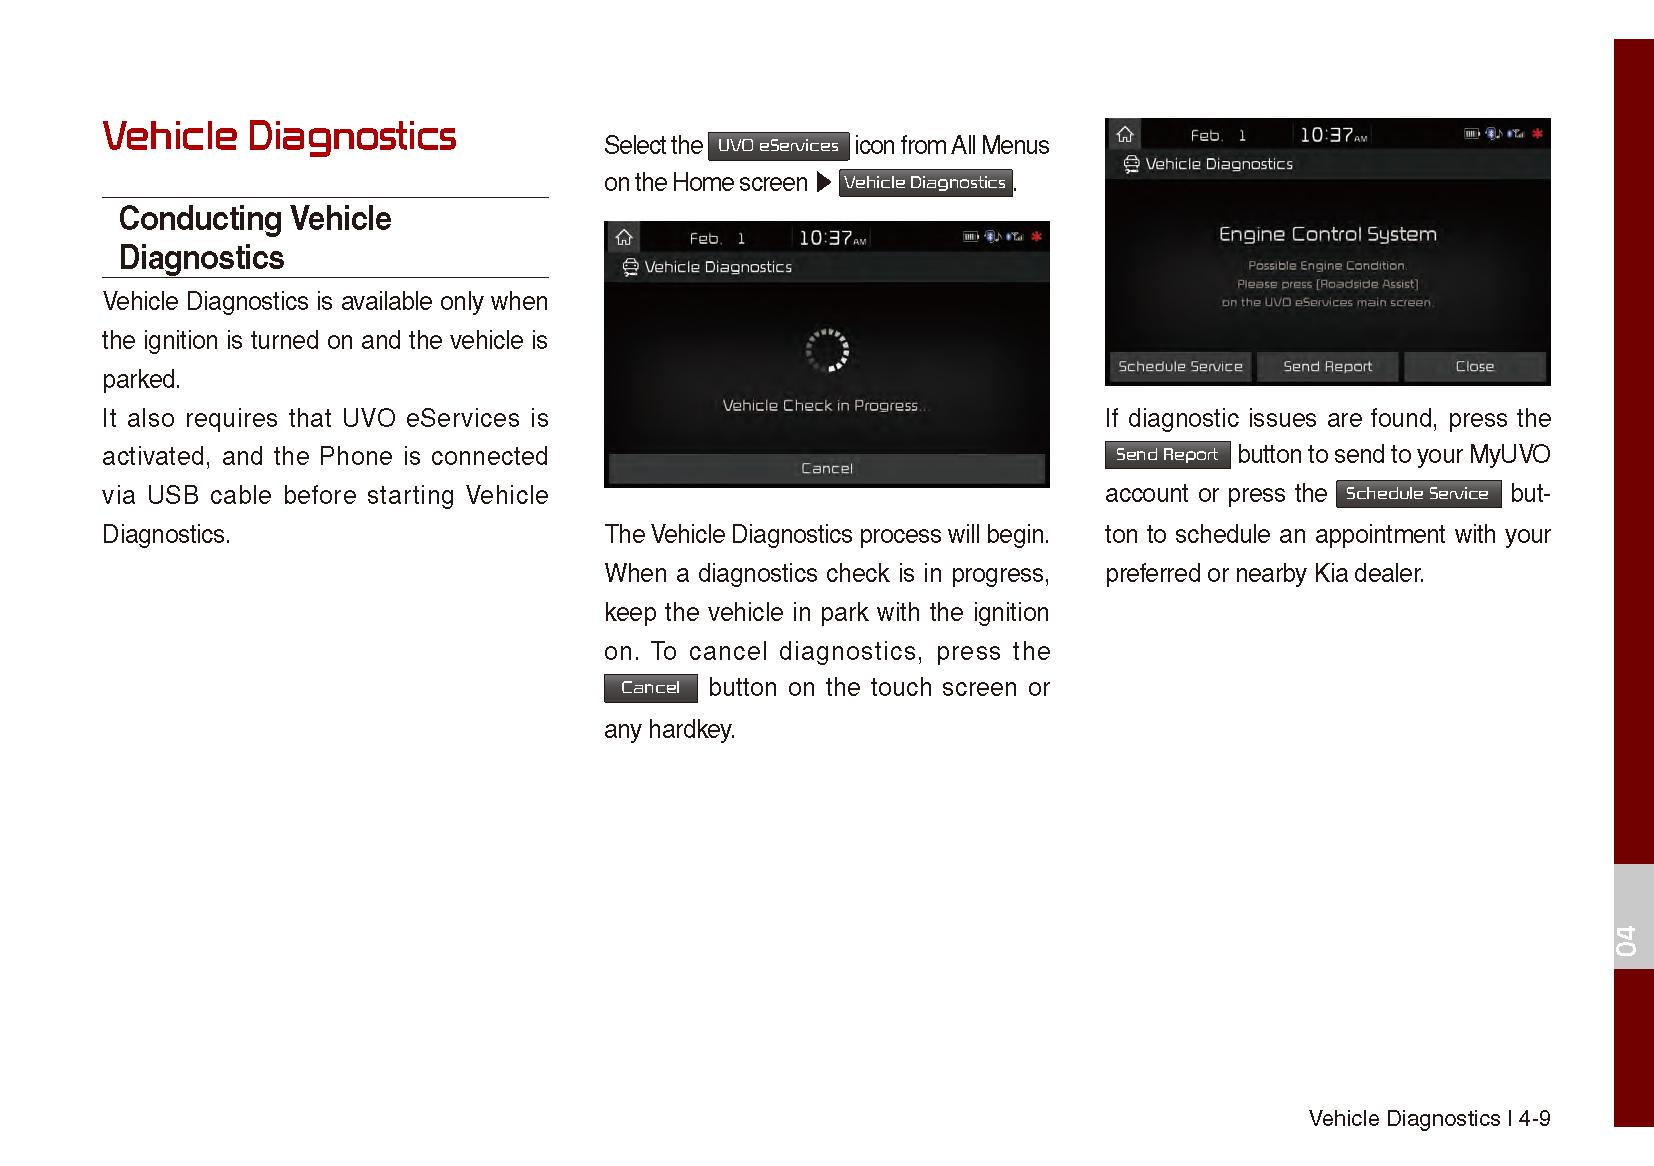 Car Multimedia System User's Manual for the Kia Stinger Downloadable PDF  File